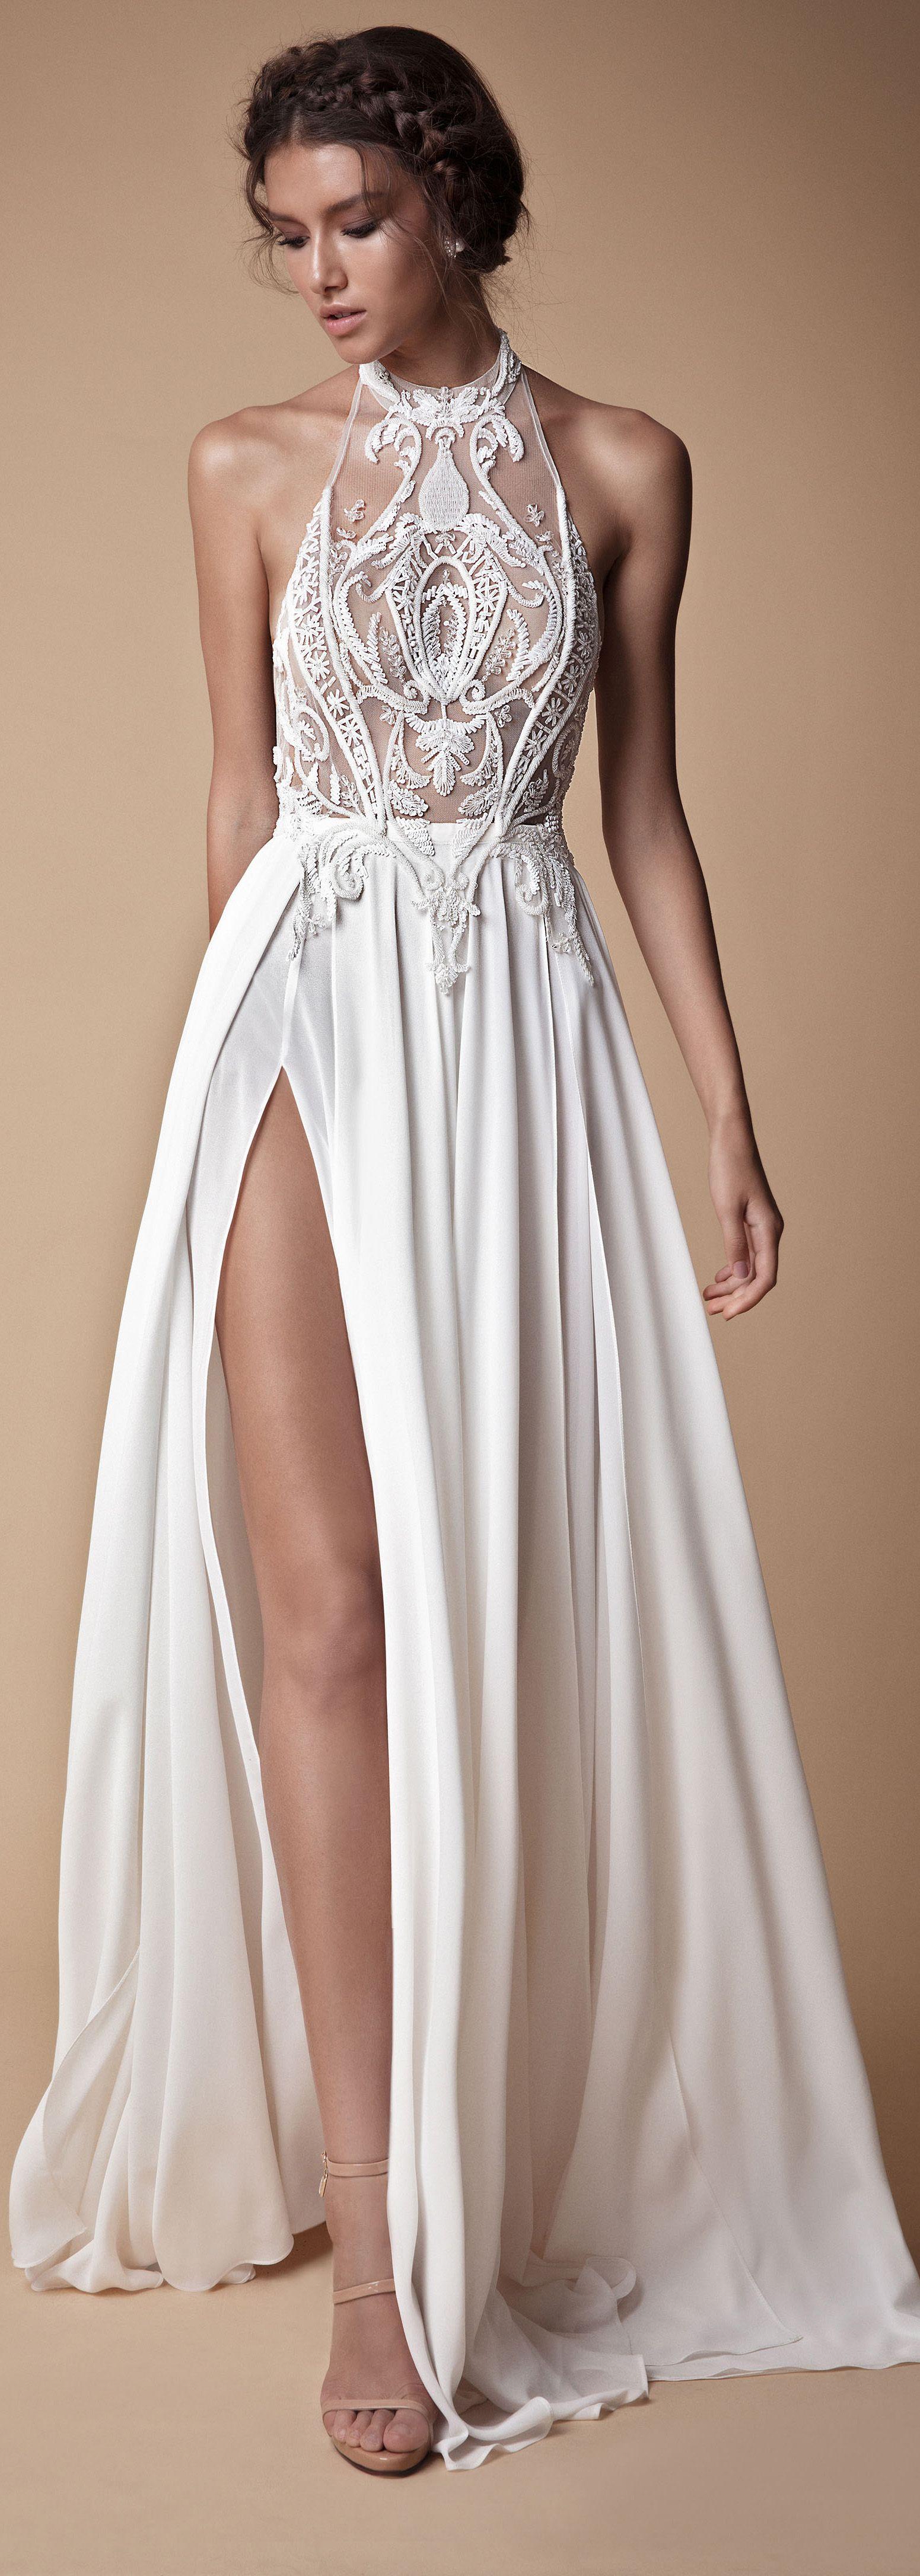 long prom dresses oneshoulder beaded prom dresses blue ombre